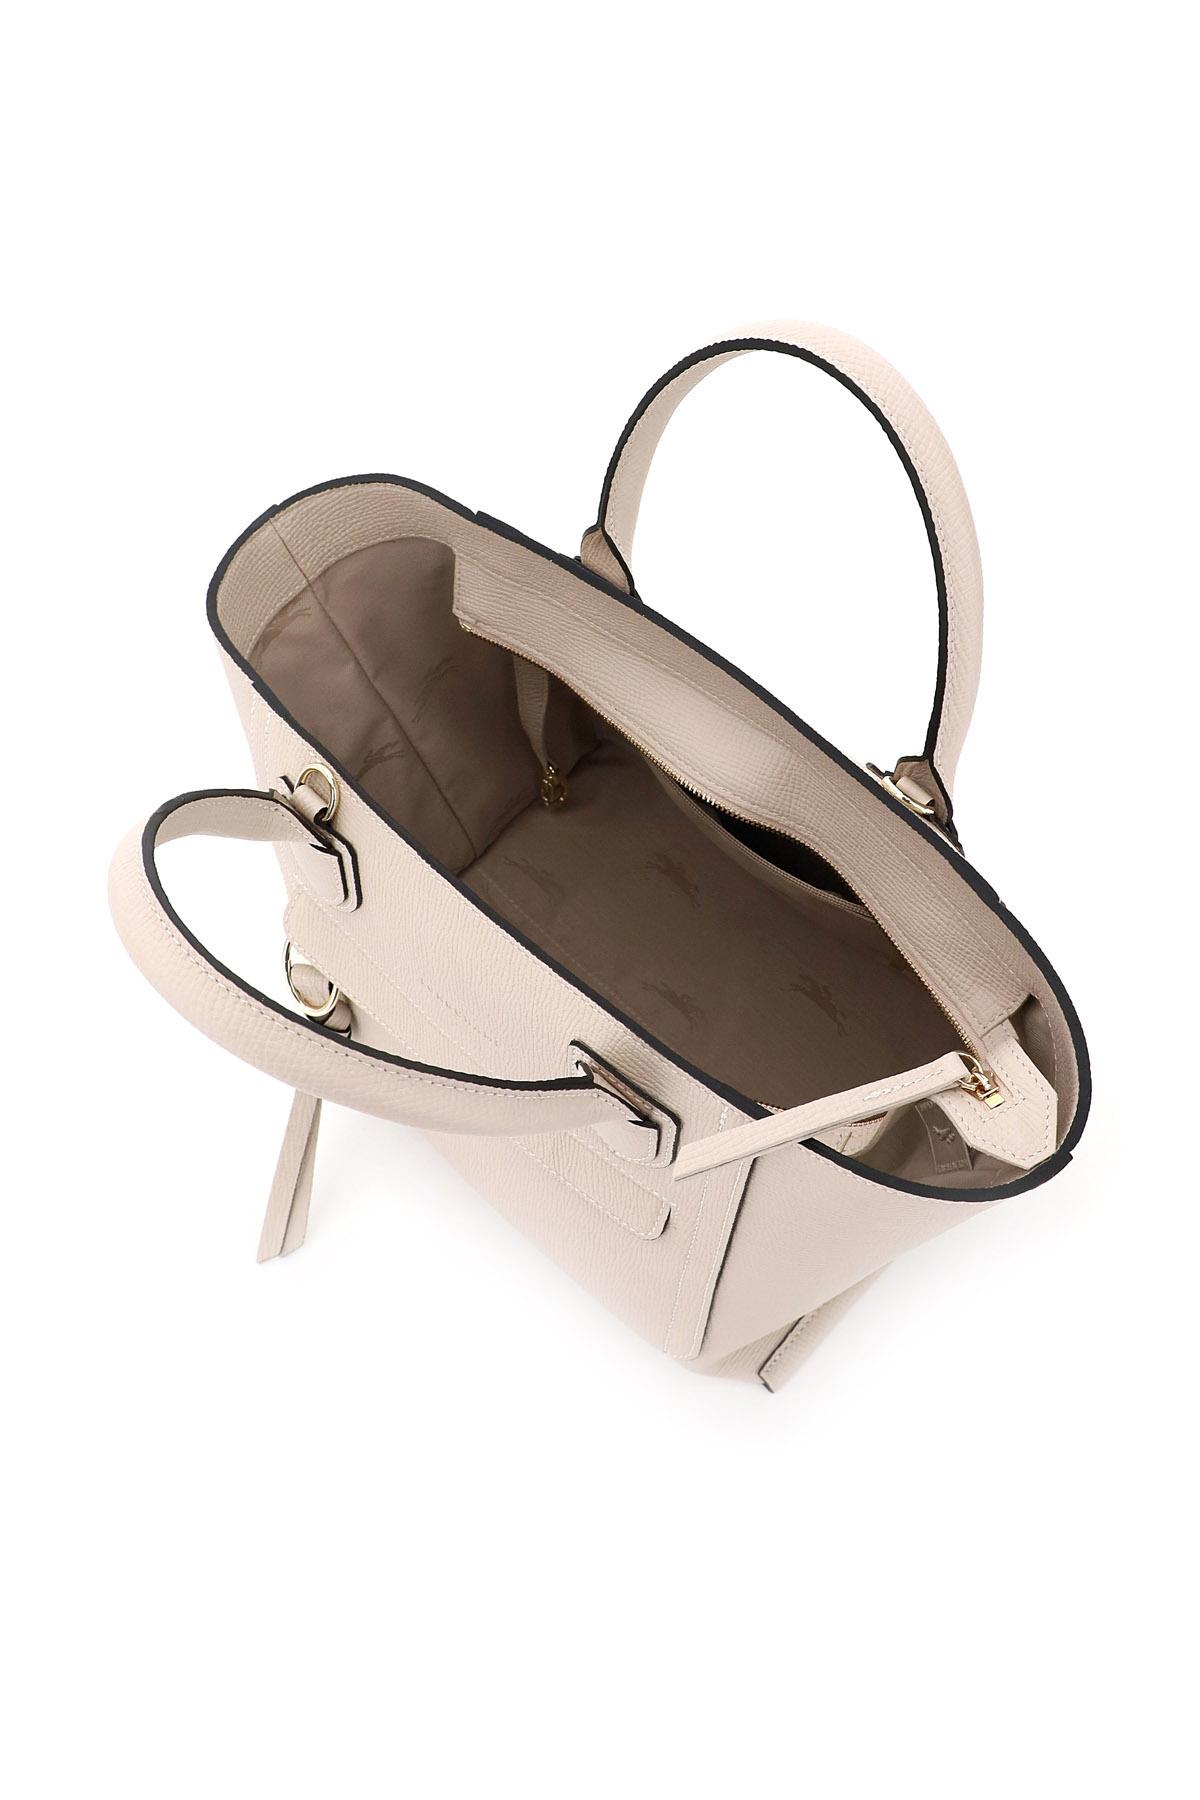 Longchamp borsa shopper mailbox medium